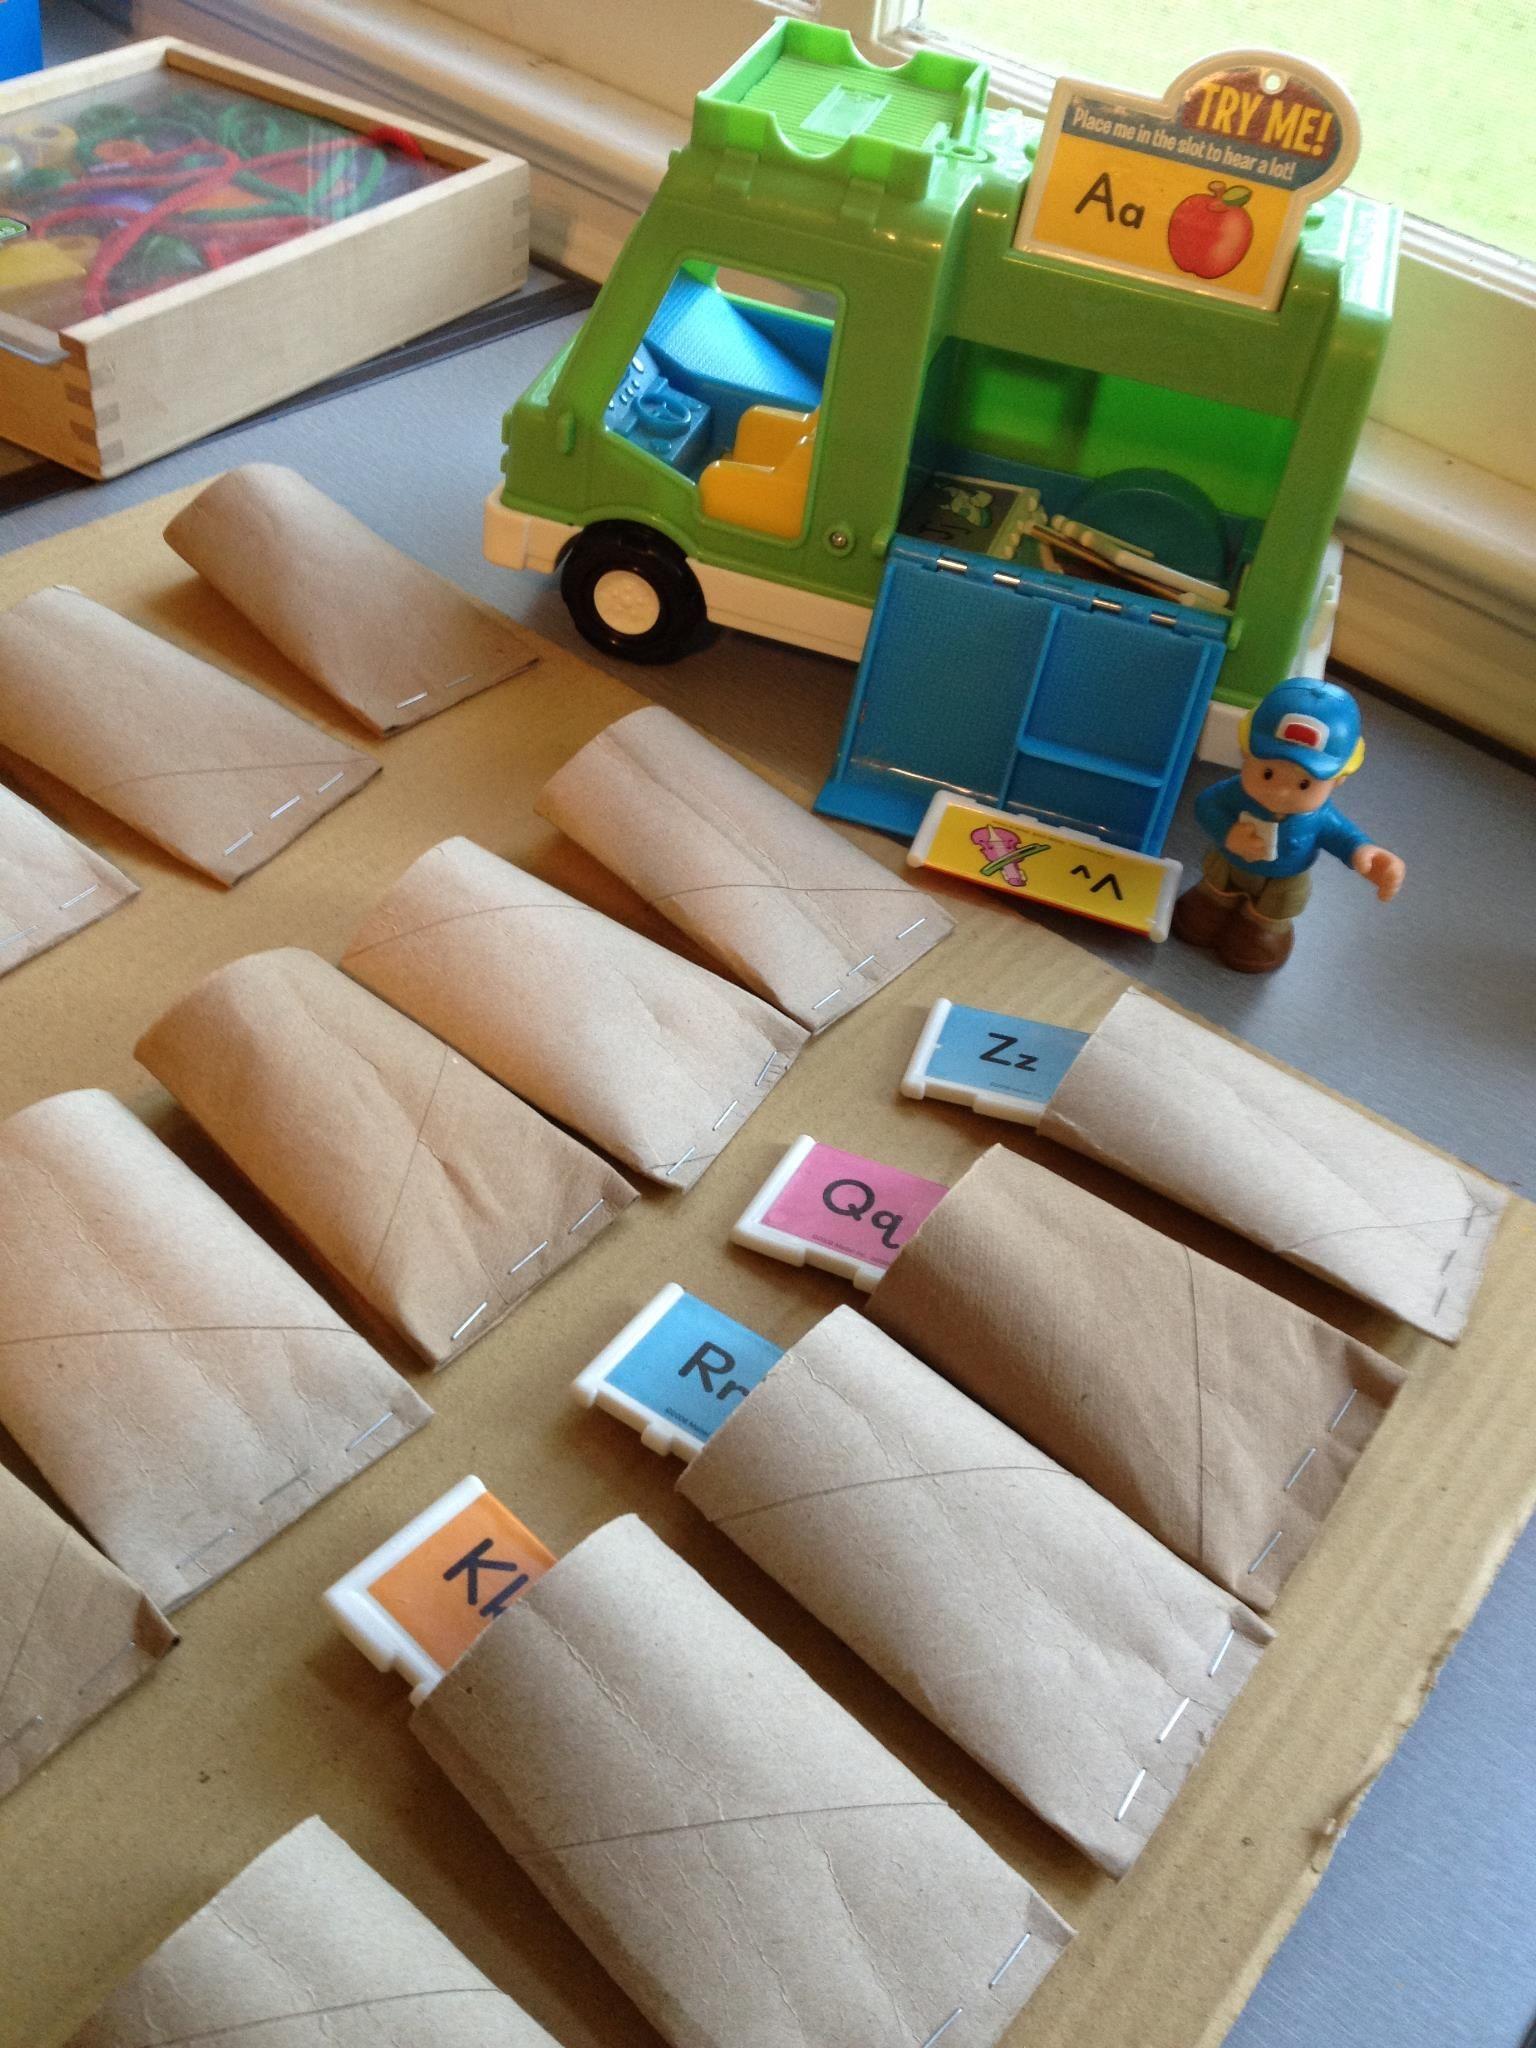 FREE DIY classroom pocket chart! Take old toilet paper